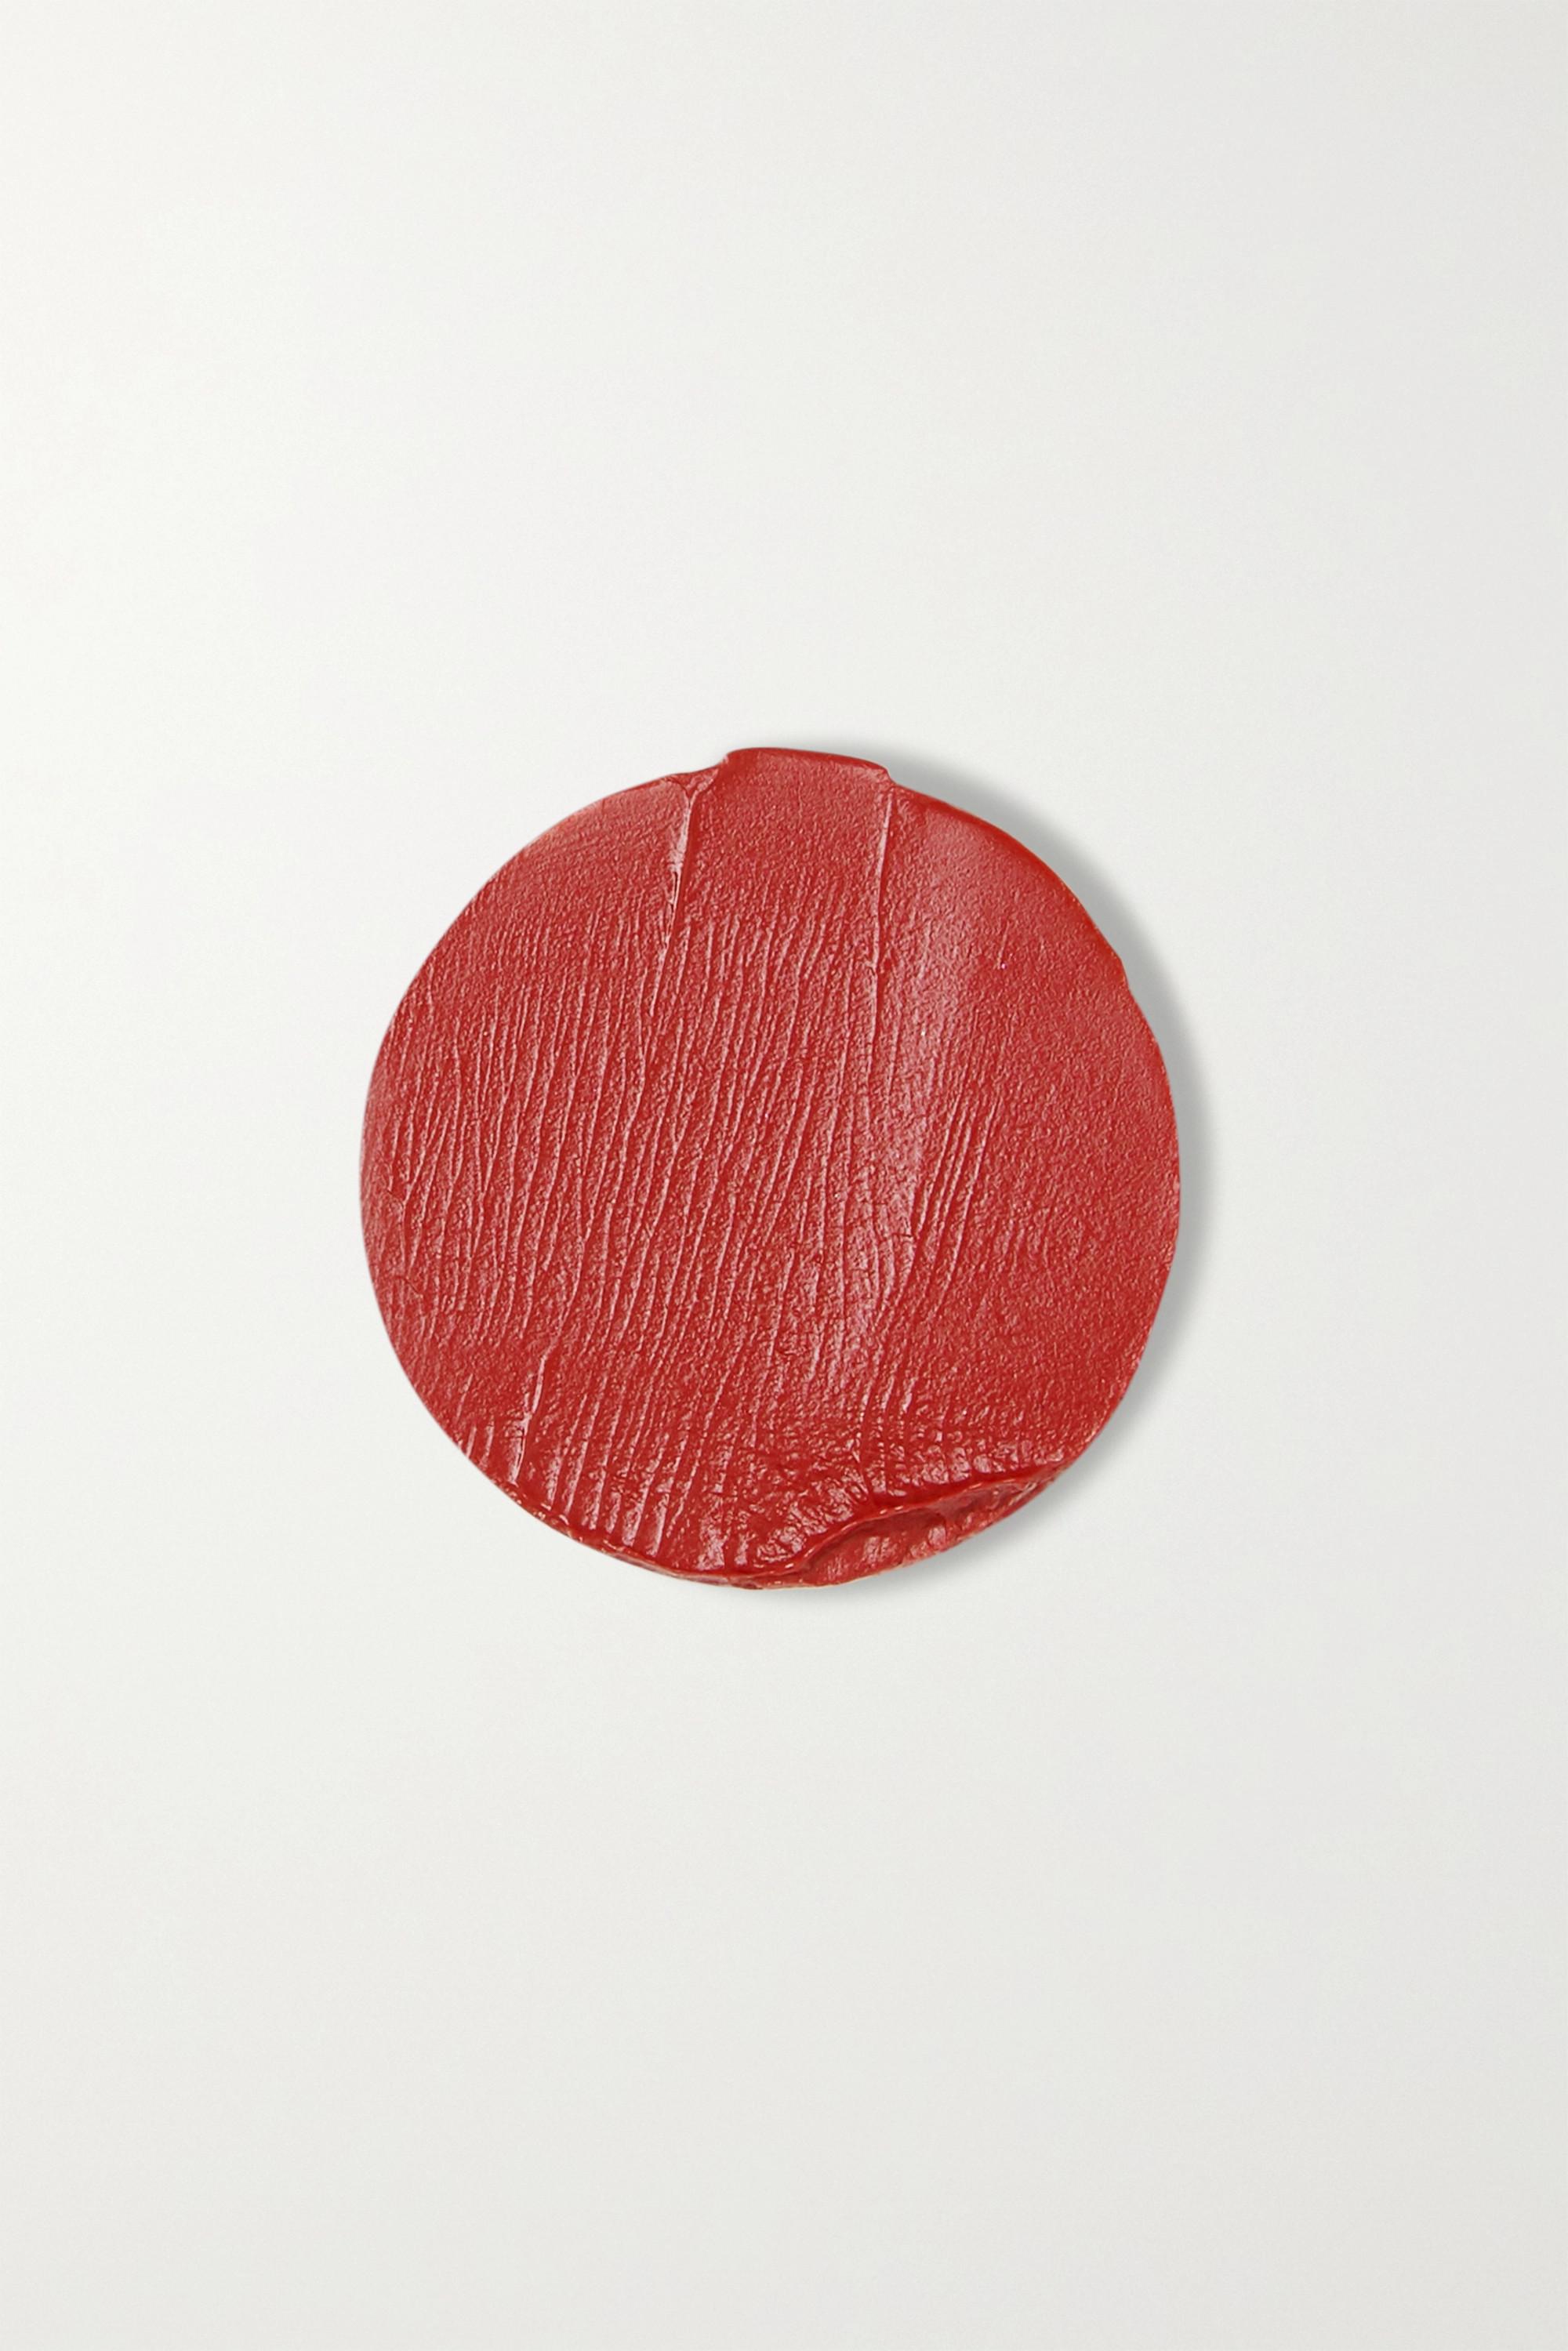 Pat McGrath Labs Lip Fetish Divinyl Lip Shine - Temptress